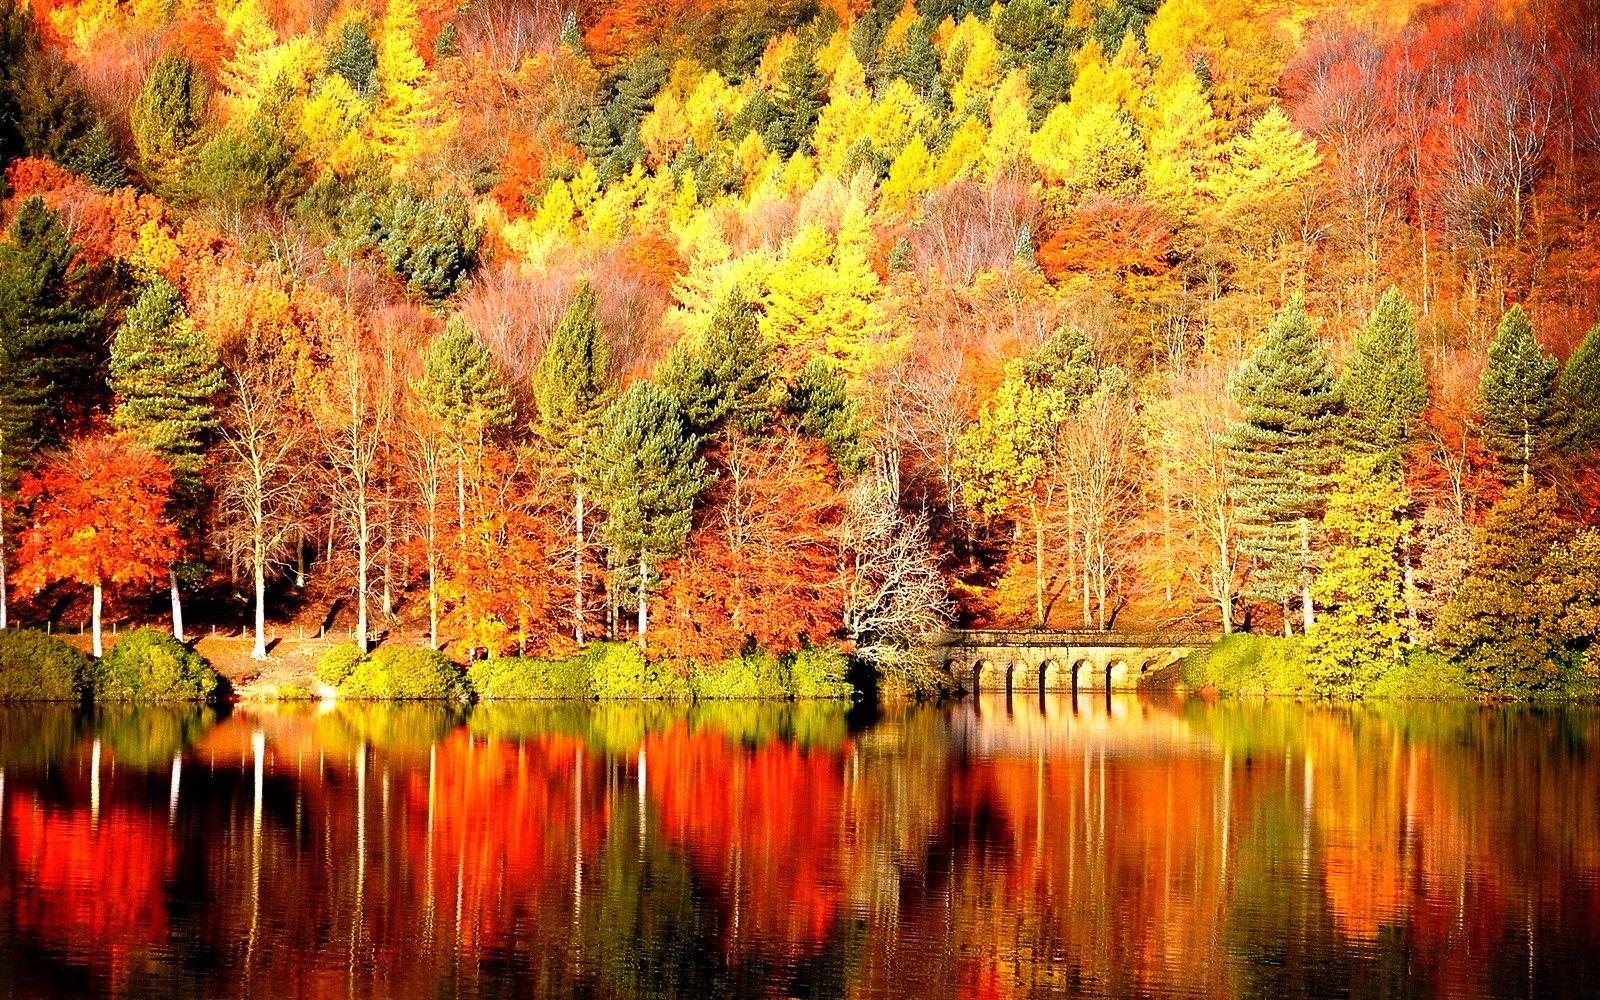 Pin By B T Haynes On Outdoor Fall Desktop Backgrounds Free Fall Wallpaper Desktop Wallpaper Fall